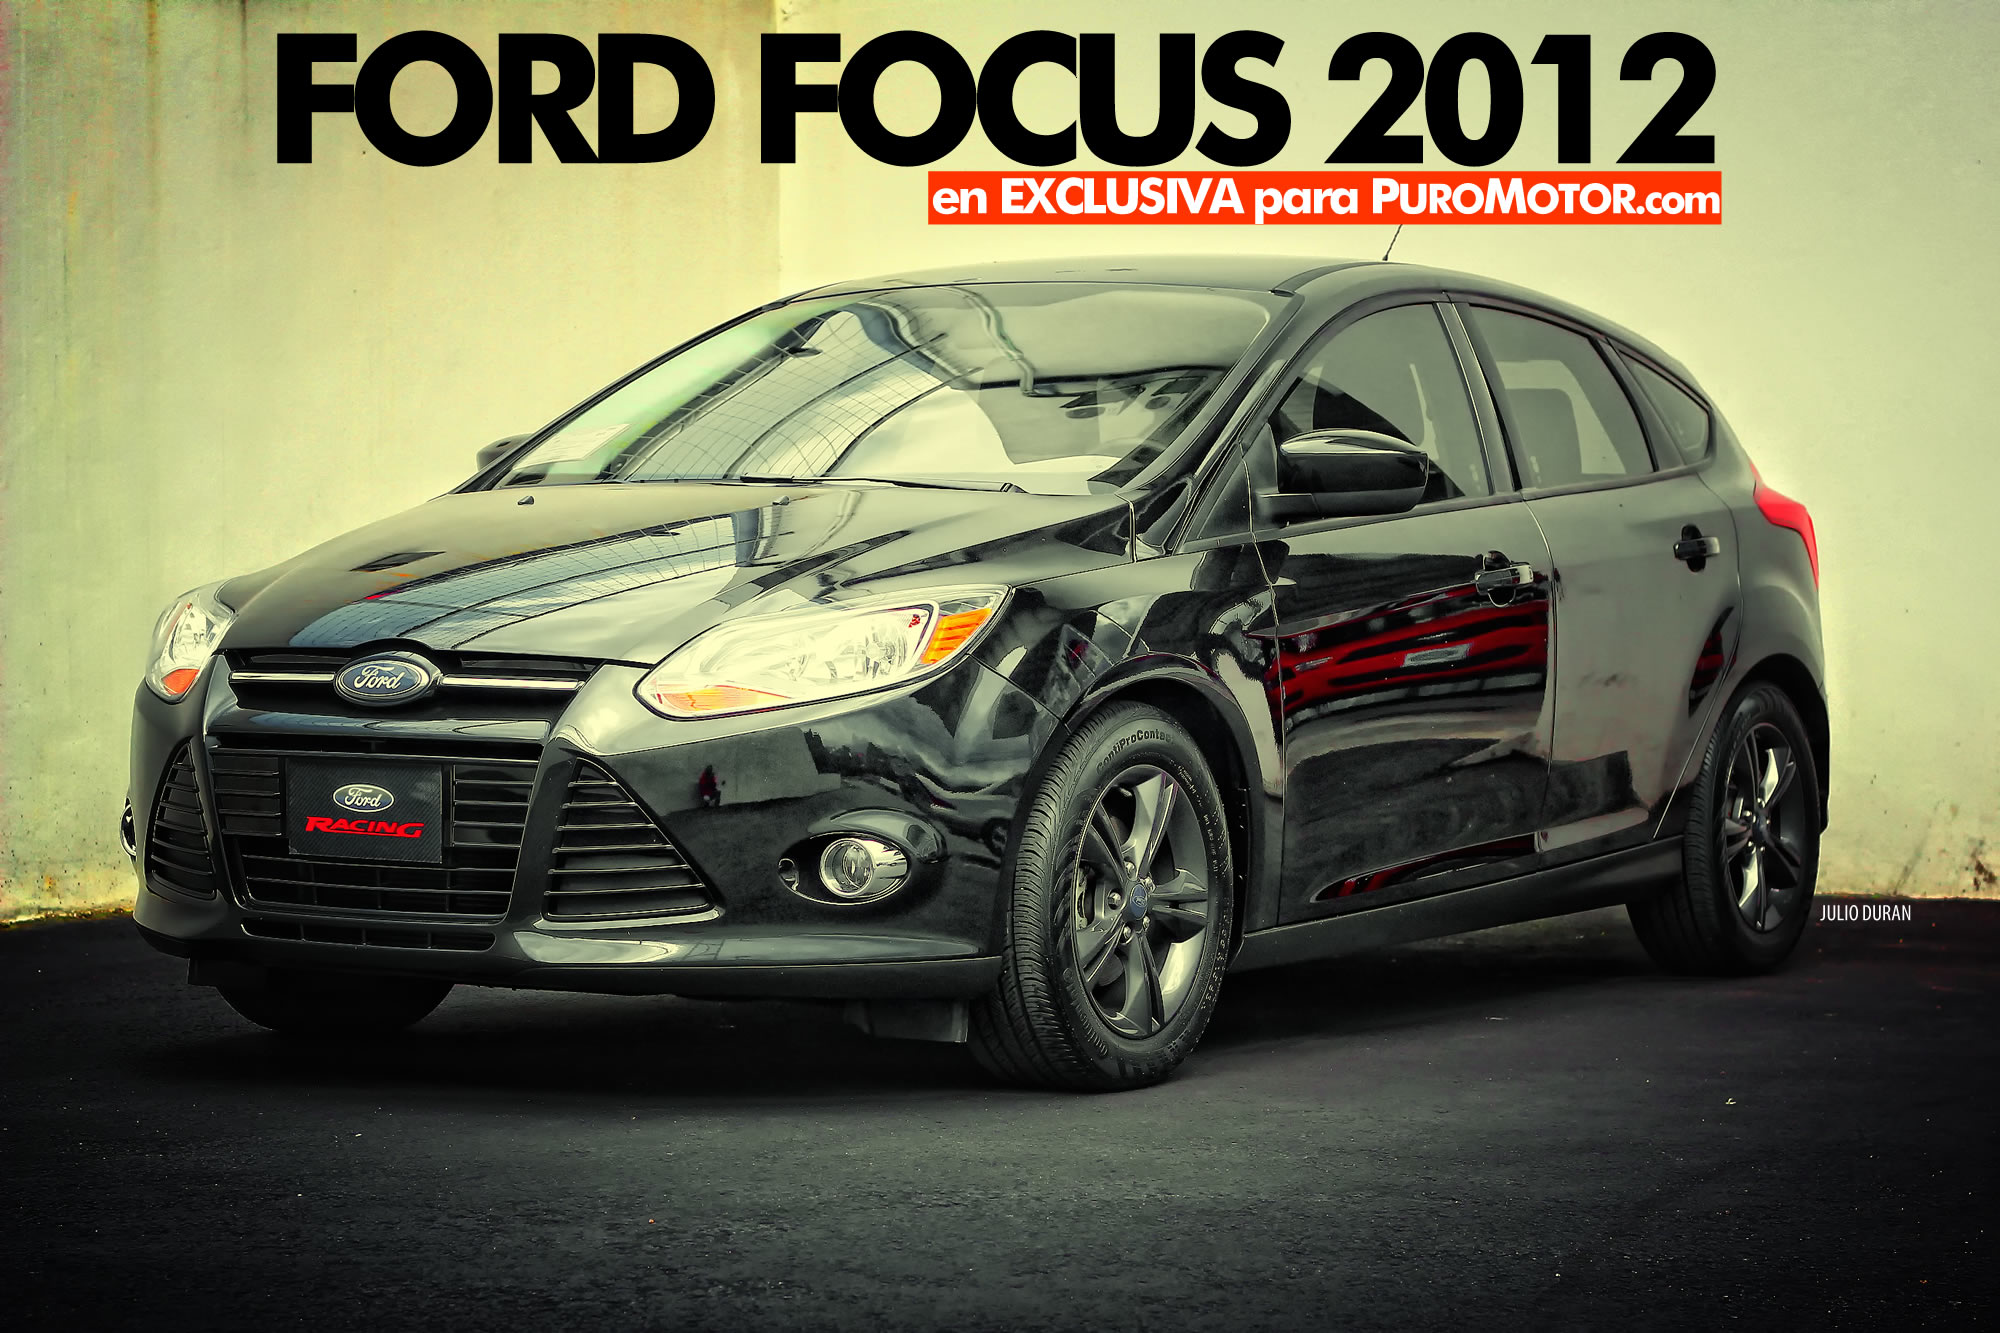 FORD_FOCUS_2012